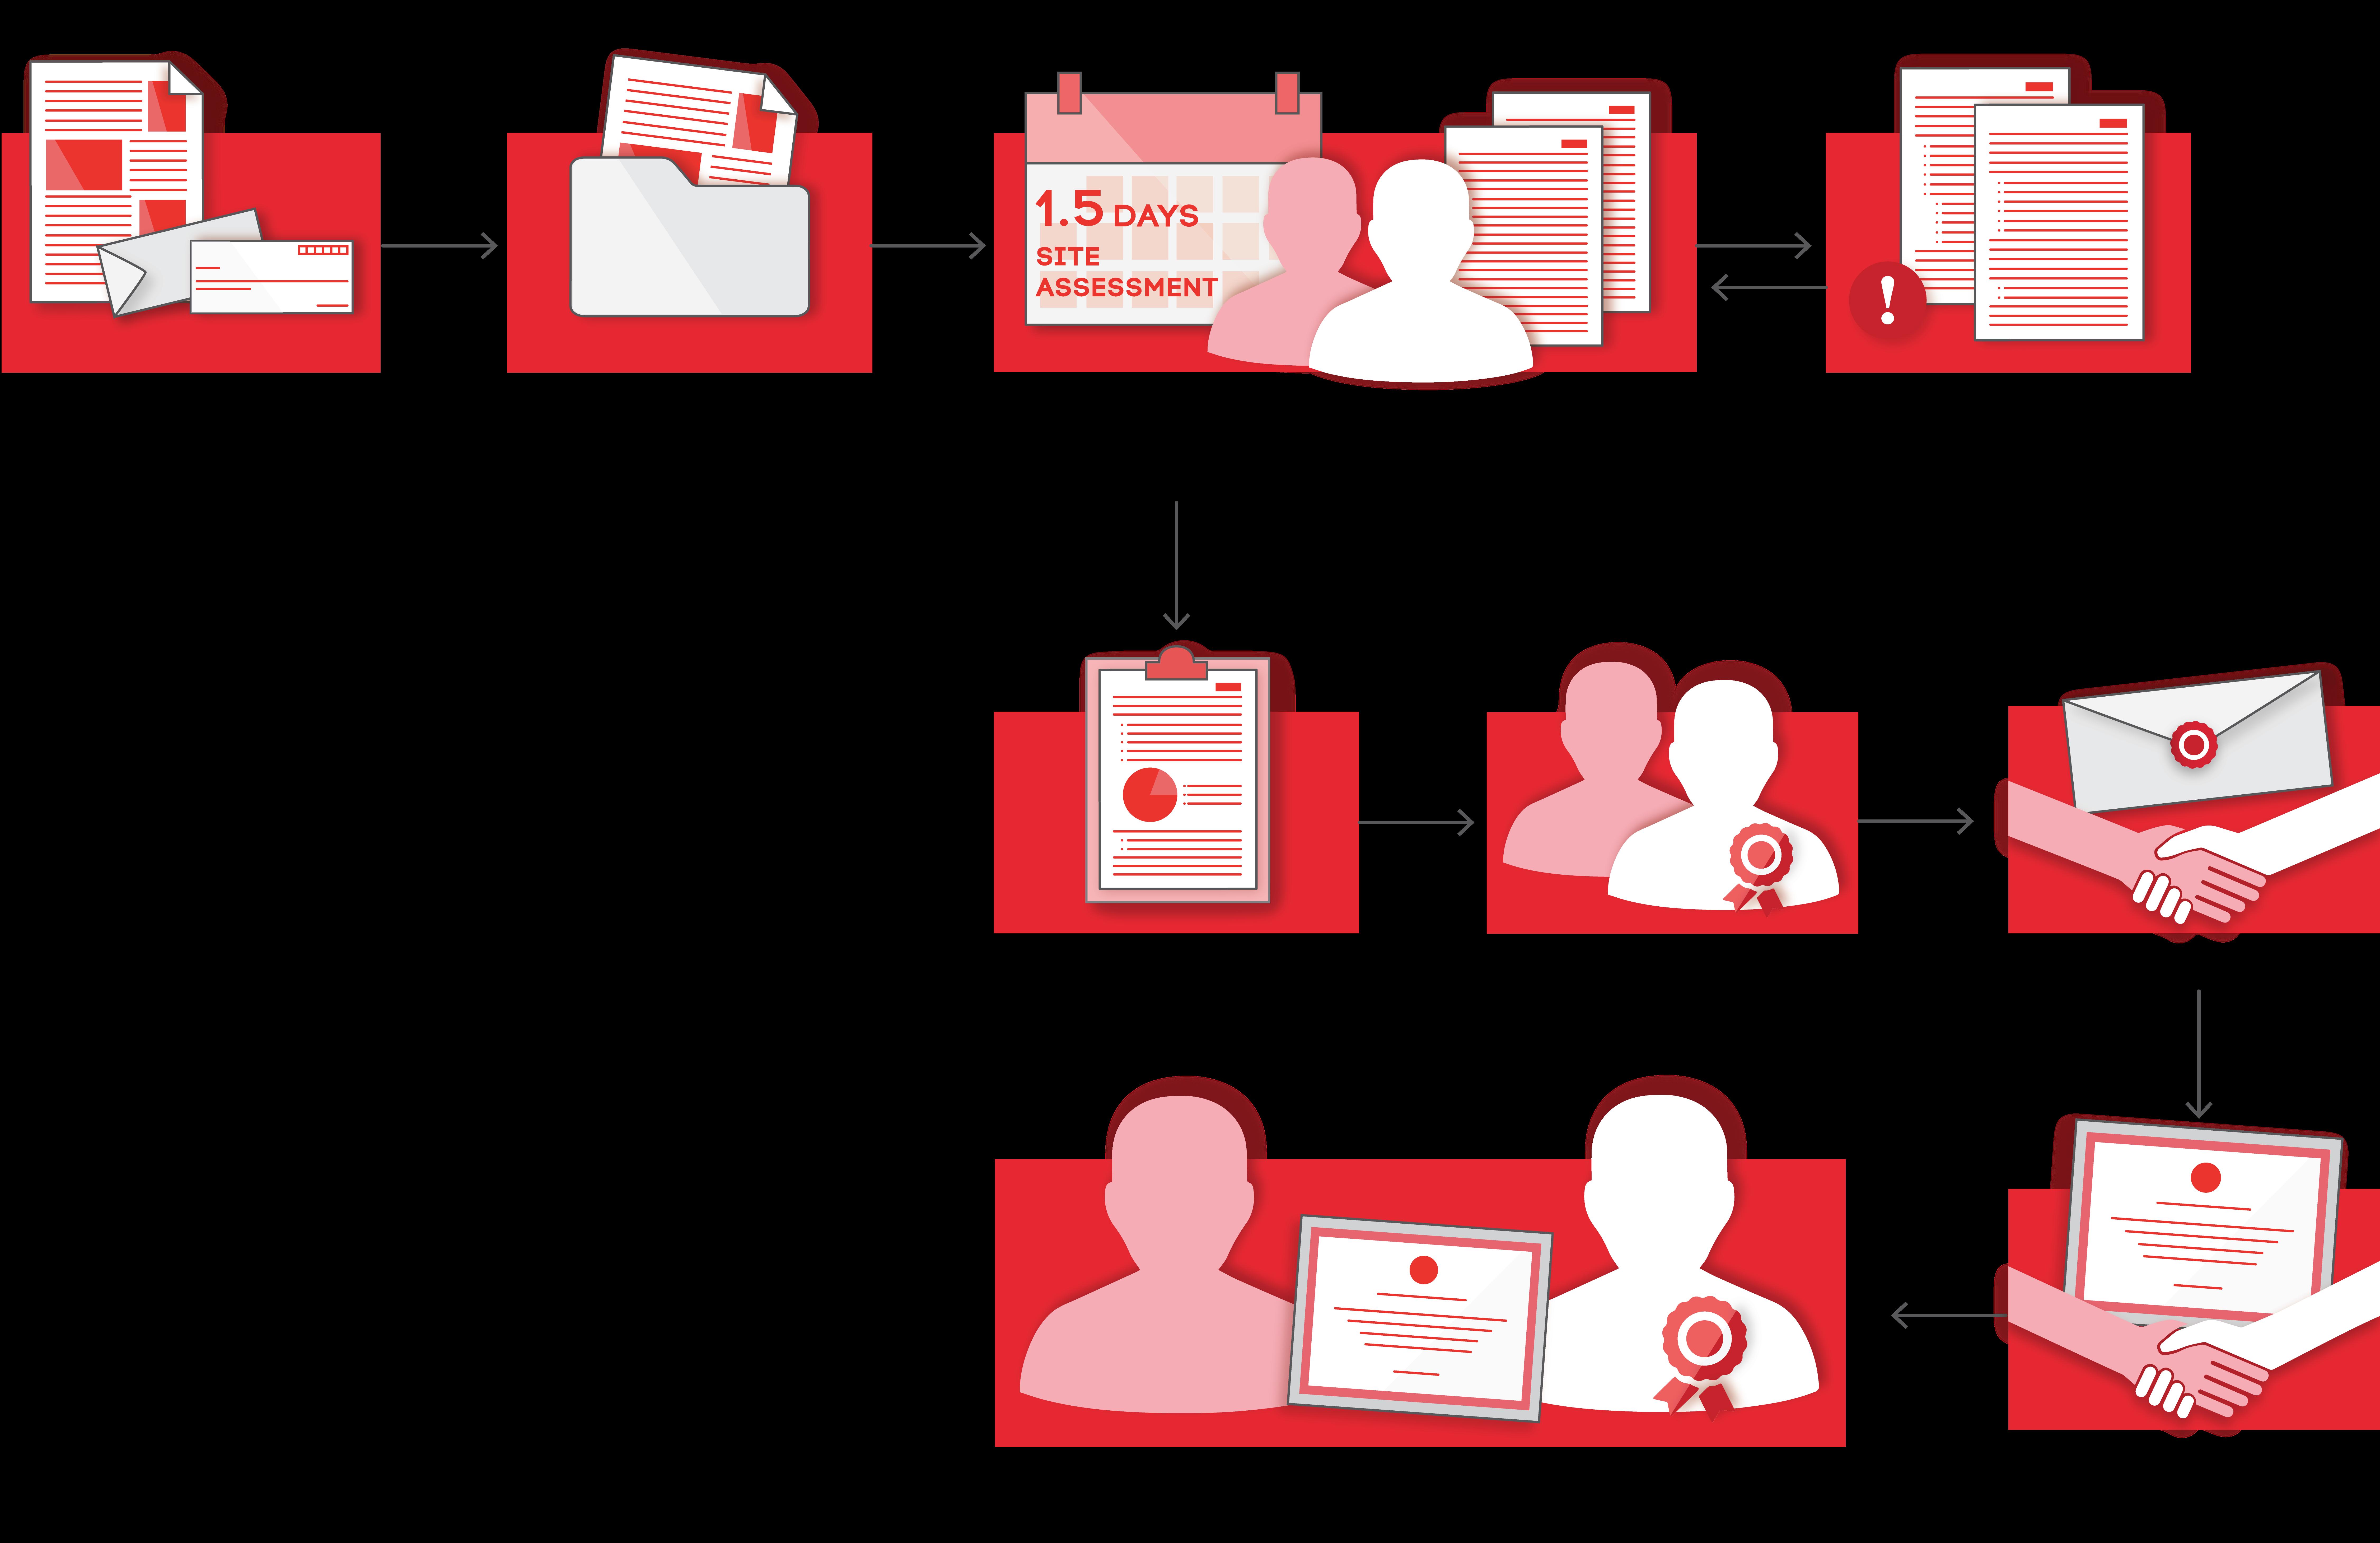 Standard audit framework design. Document clipart business letter